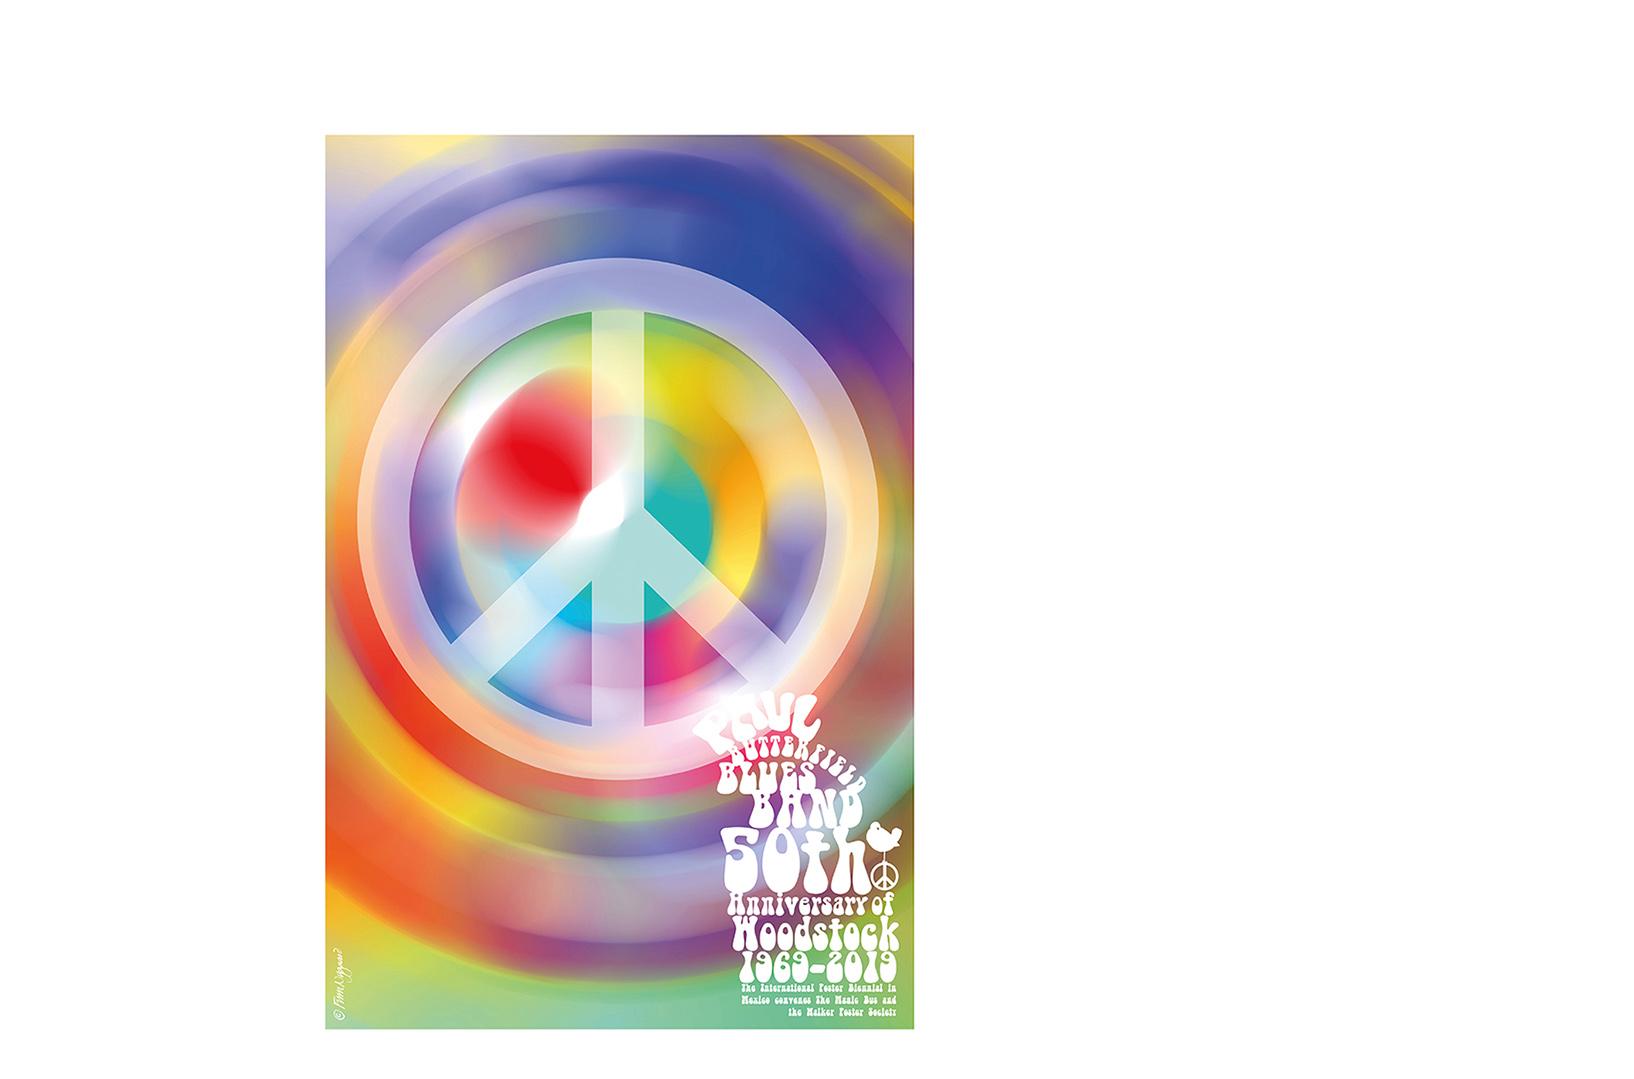 Woodstock · 1969-2019 · 50th anniversary · poster